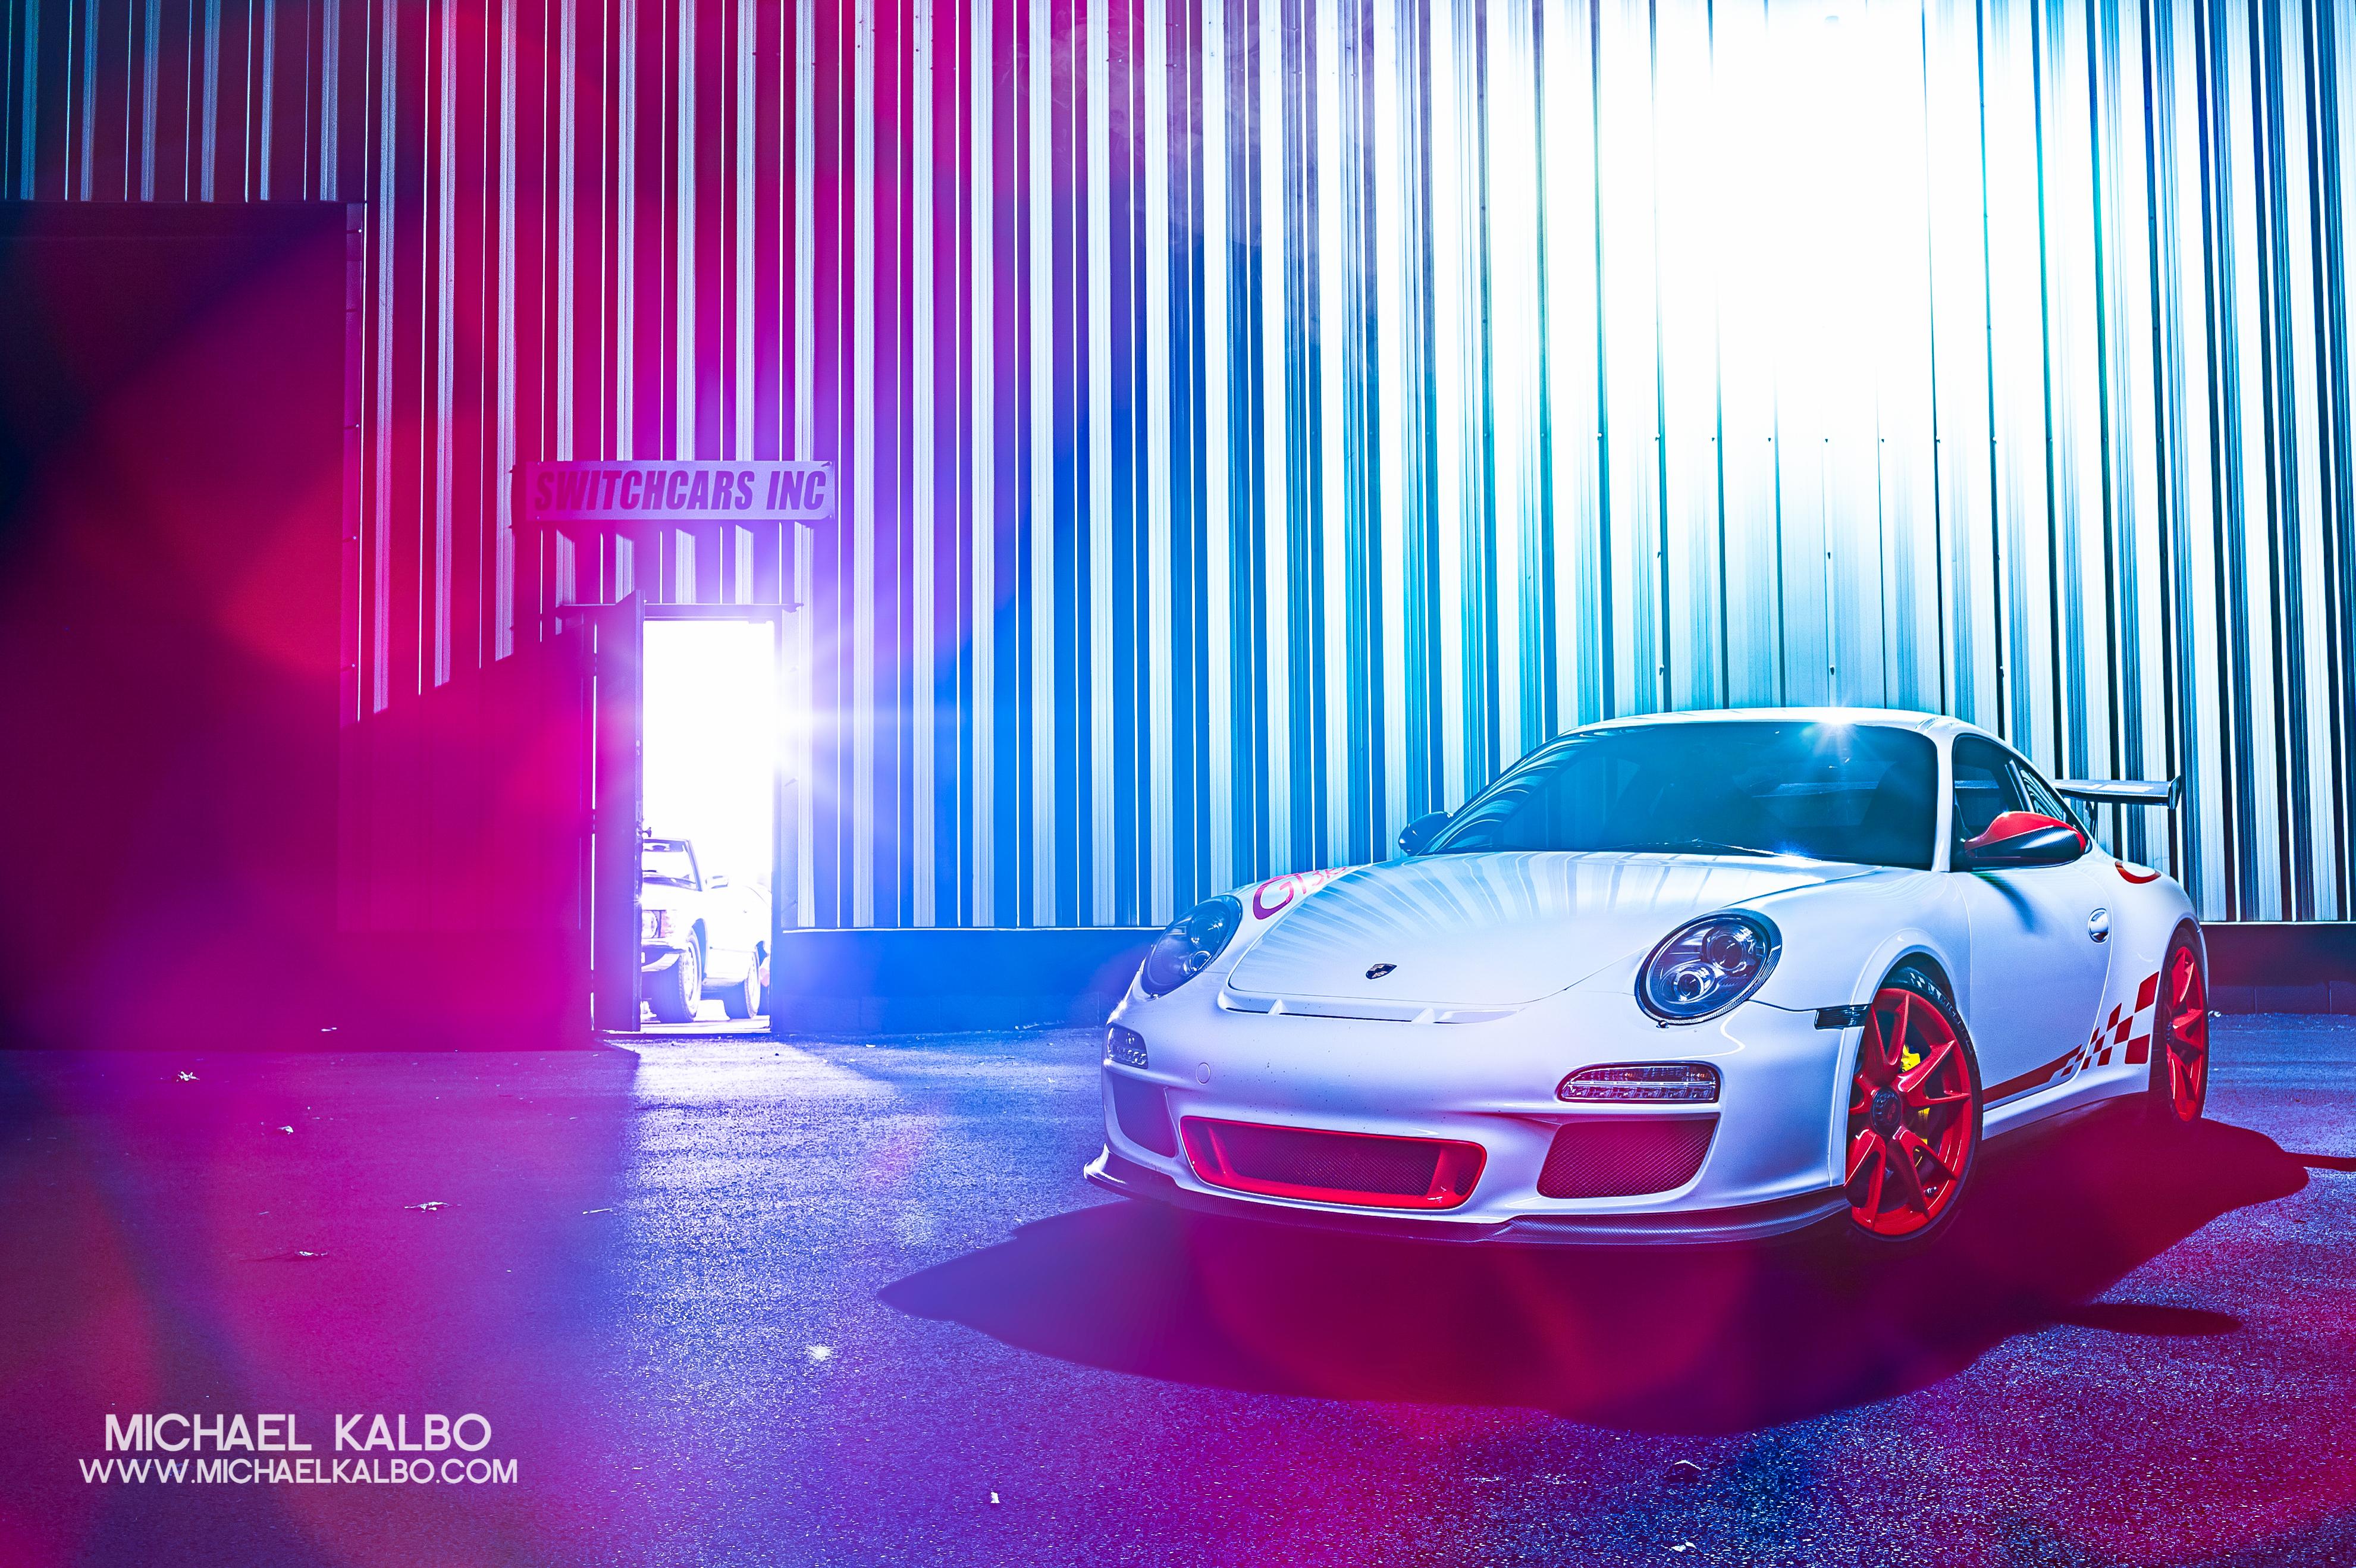 Automotive photography by Michael KALBO Simon